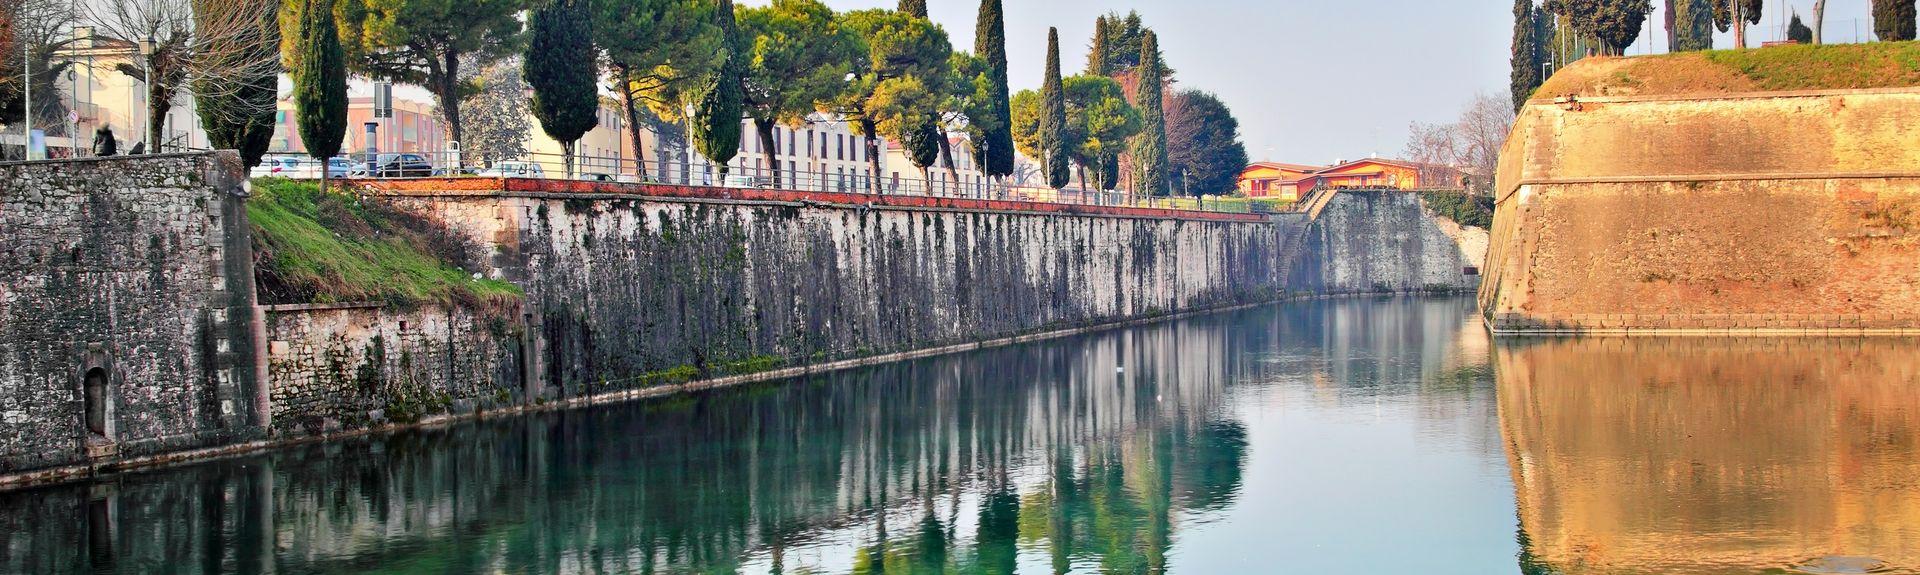 Peschiera del Garda, Veneto, Italië